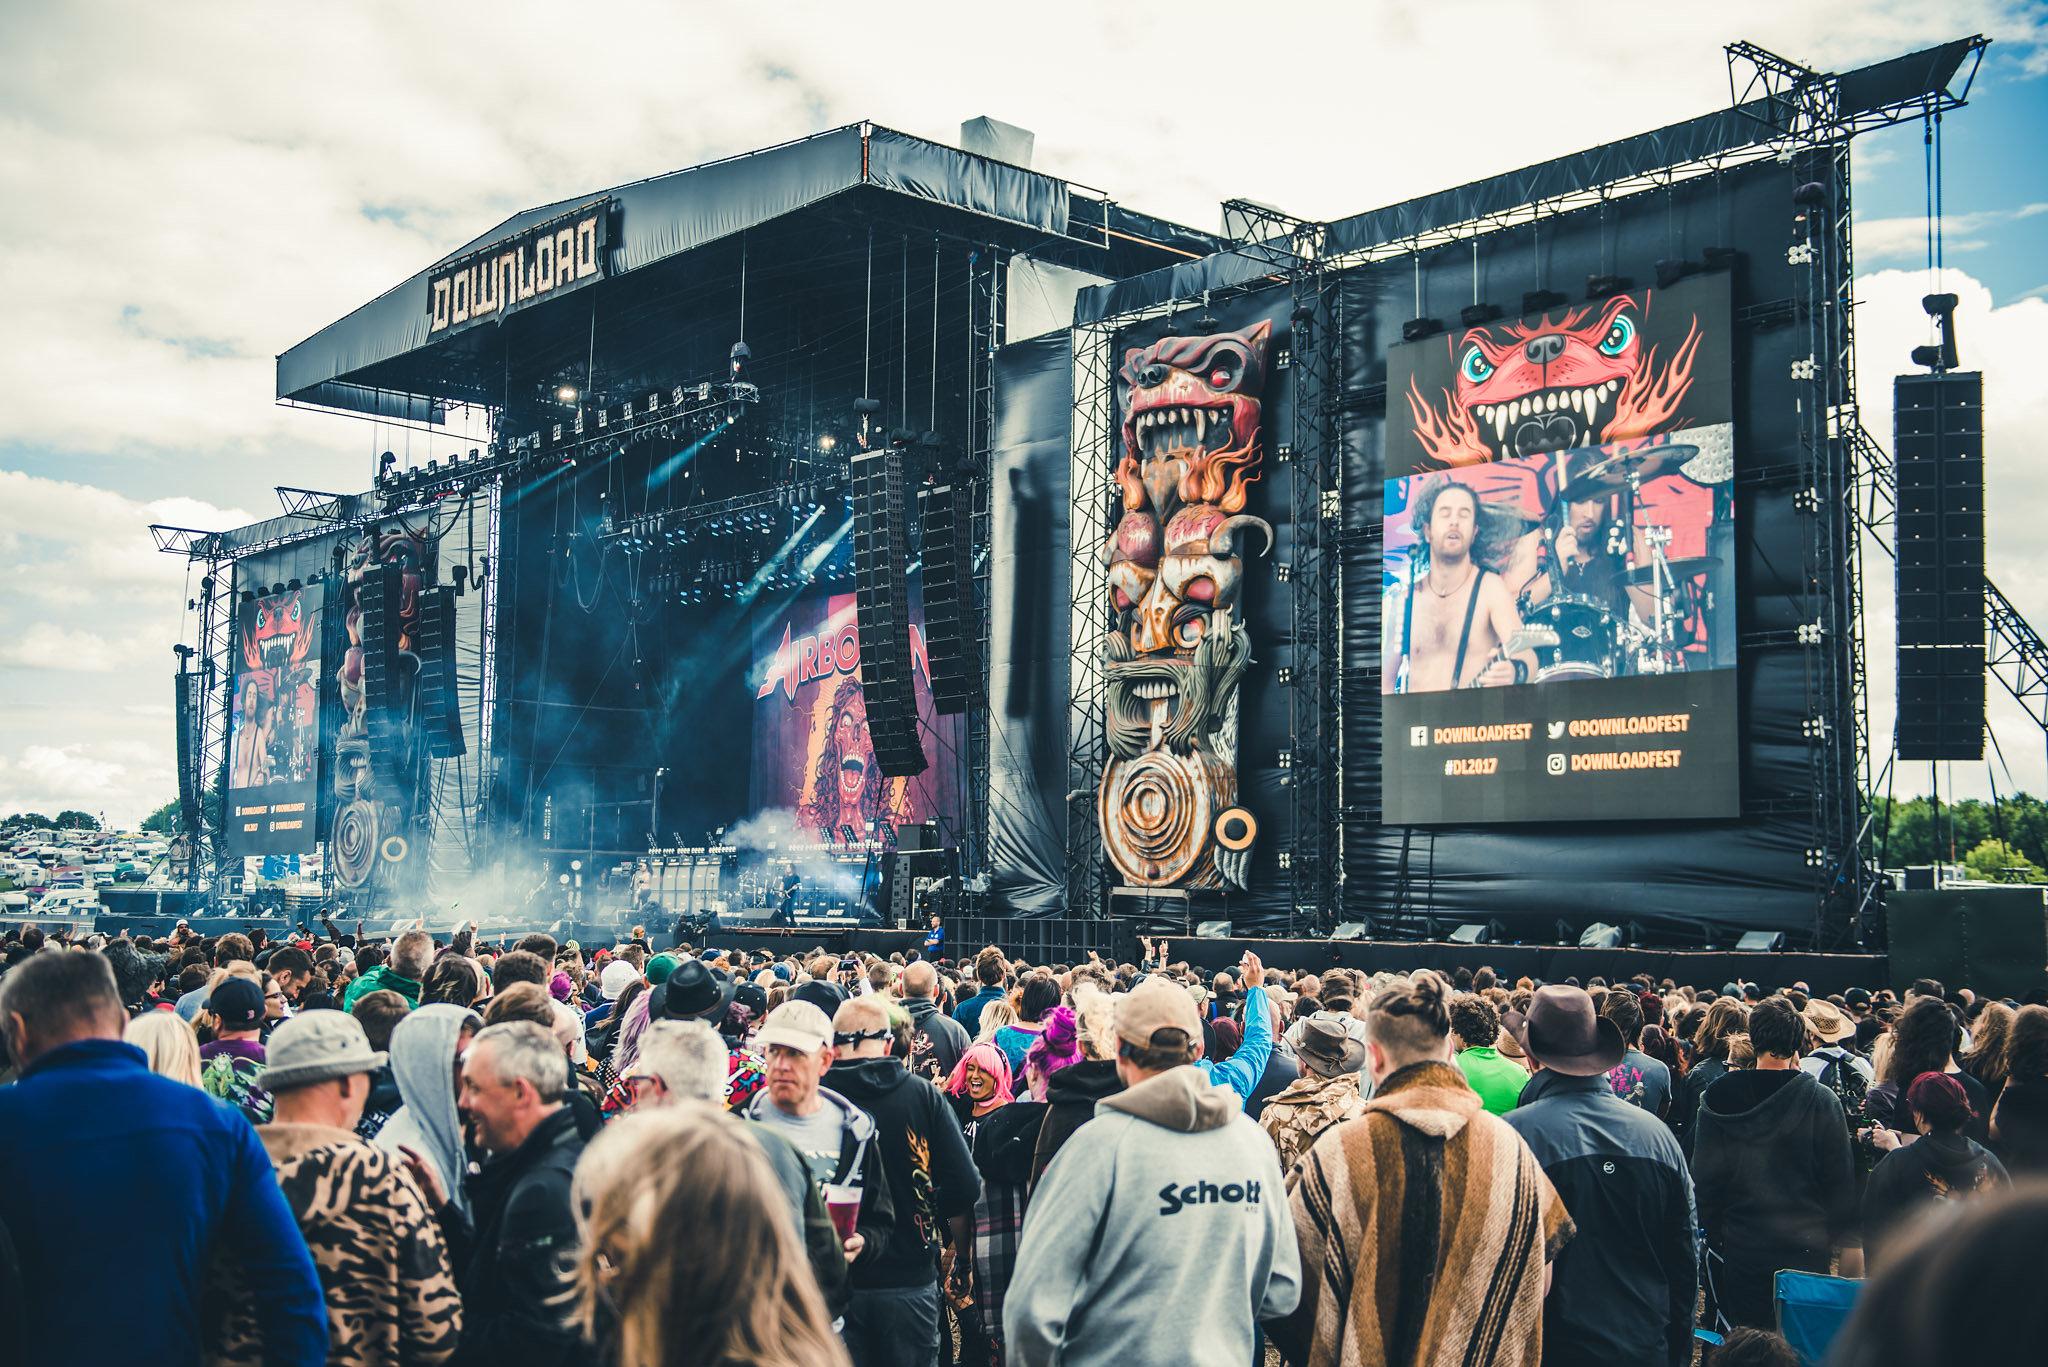 download festival - photo #27